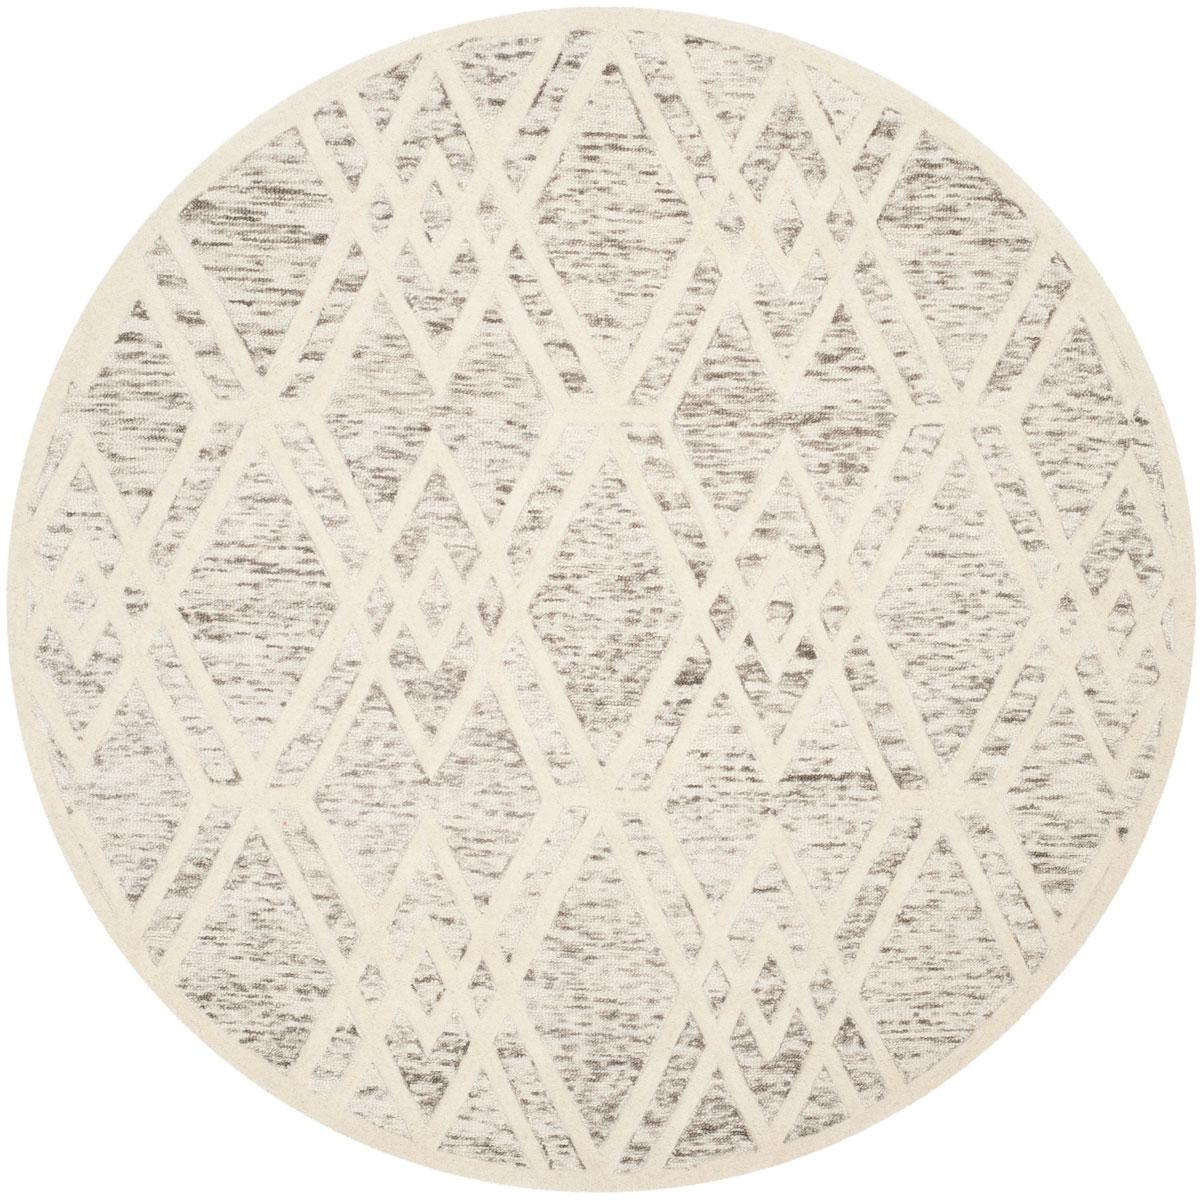 republic rugs zoom bathroom bath microplush home grey rug save bobble round mats mat